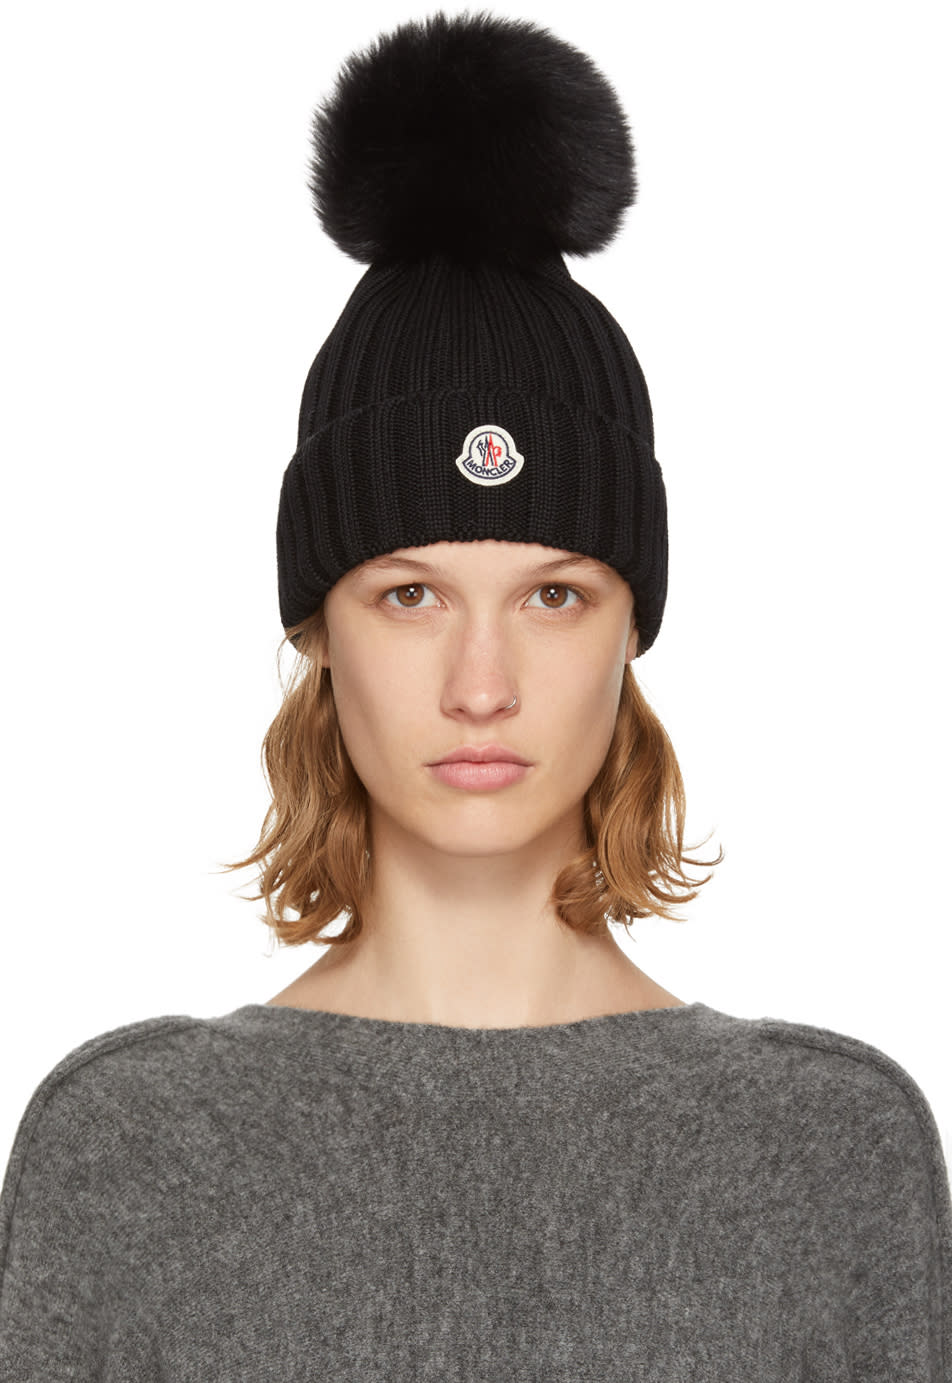 68156e9f4bb Moncler Black Fur Pom Pom Beanie